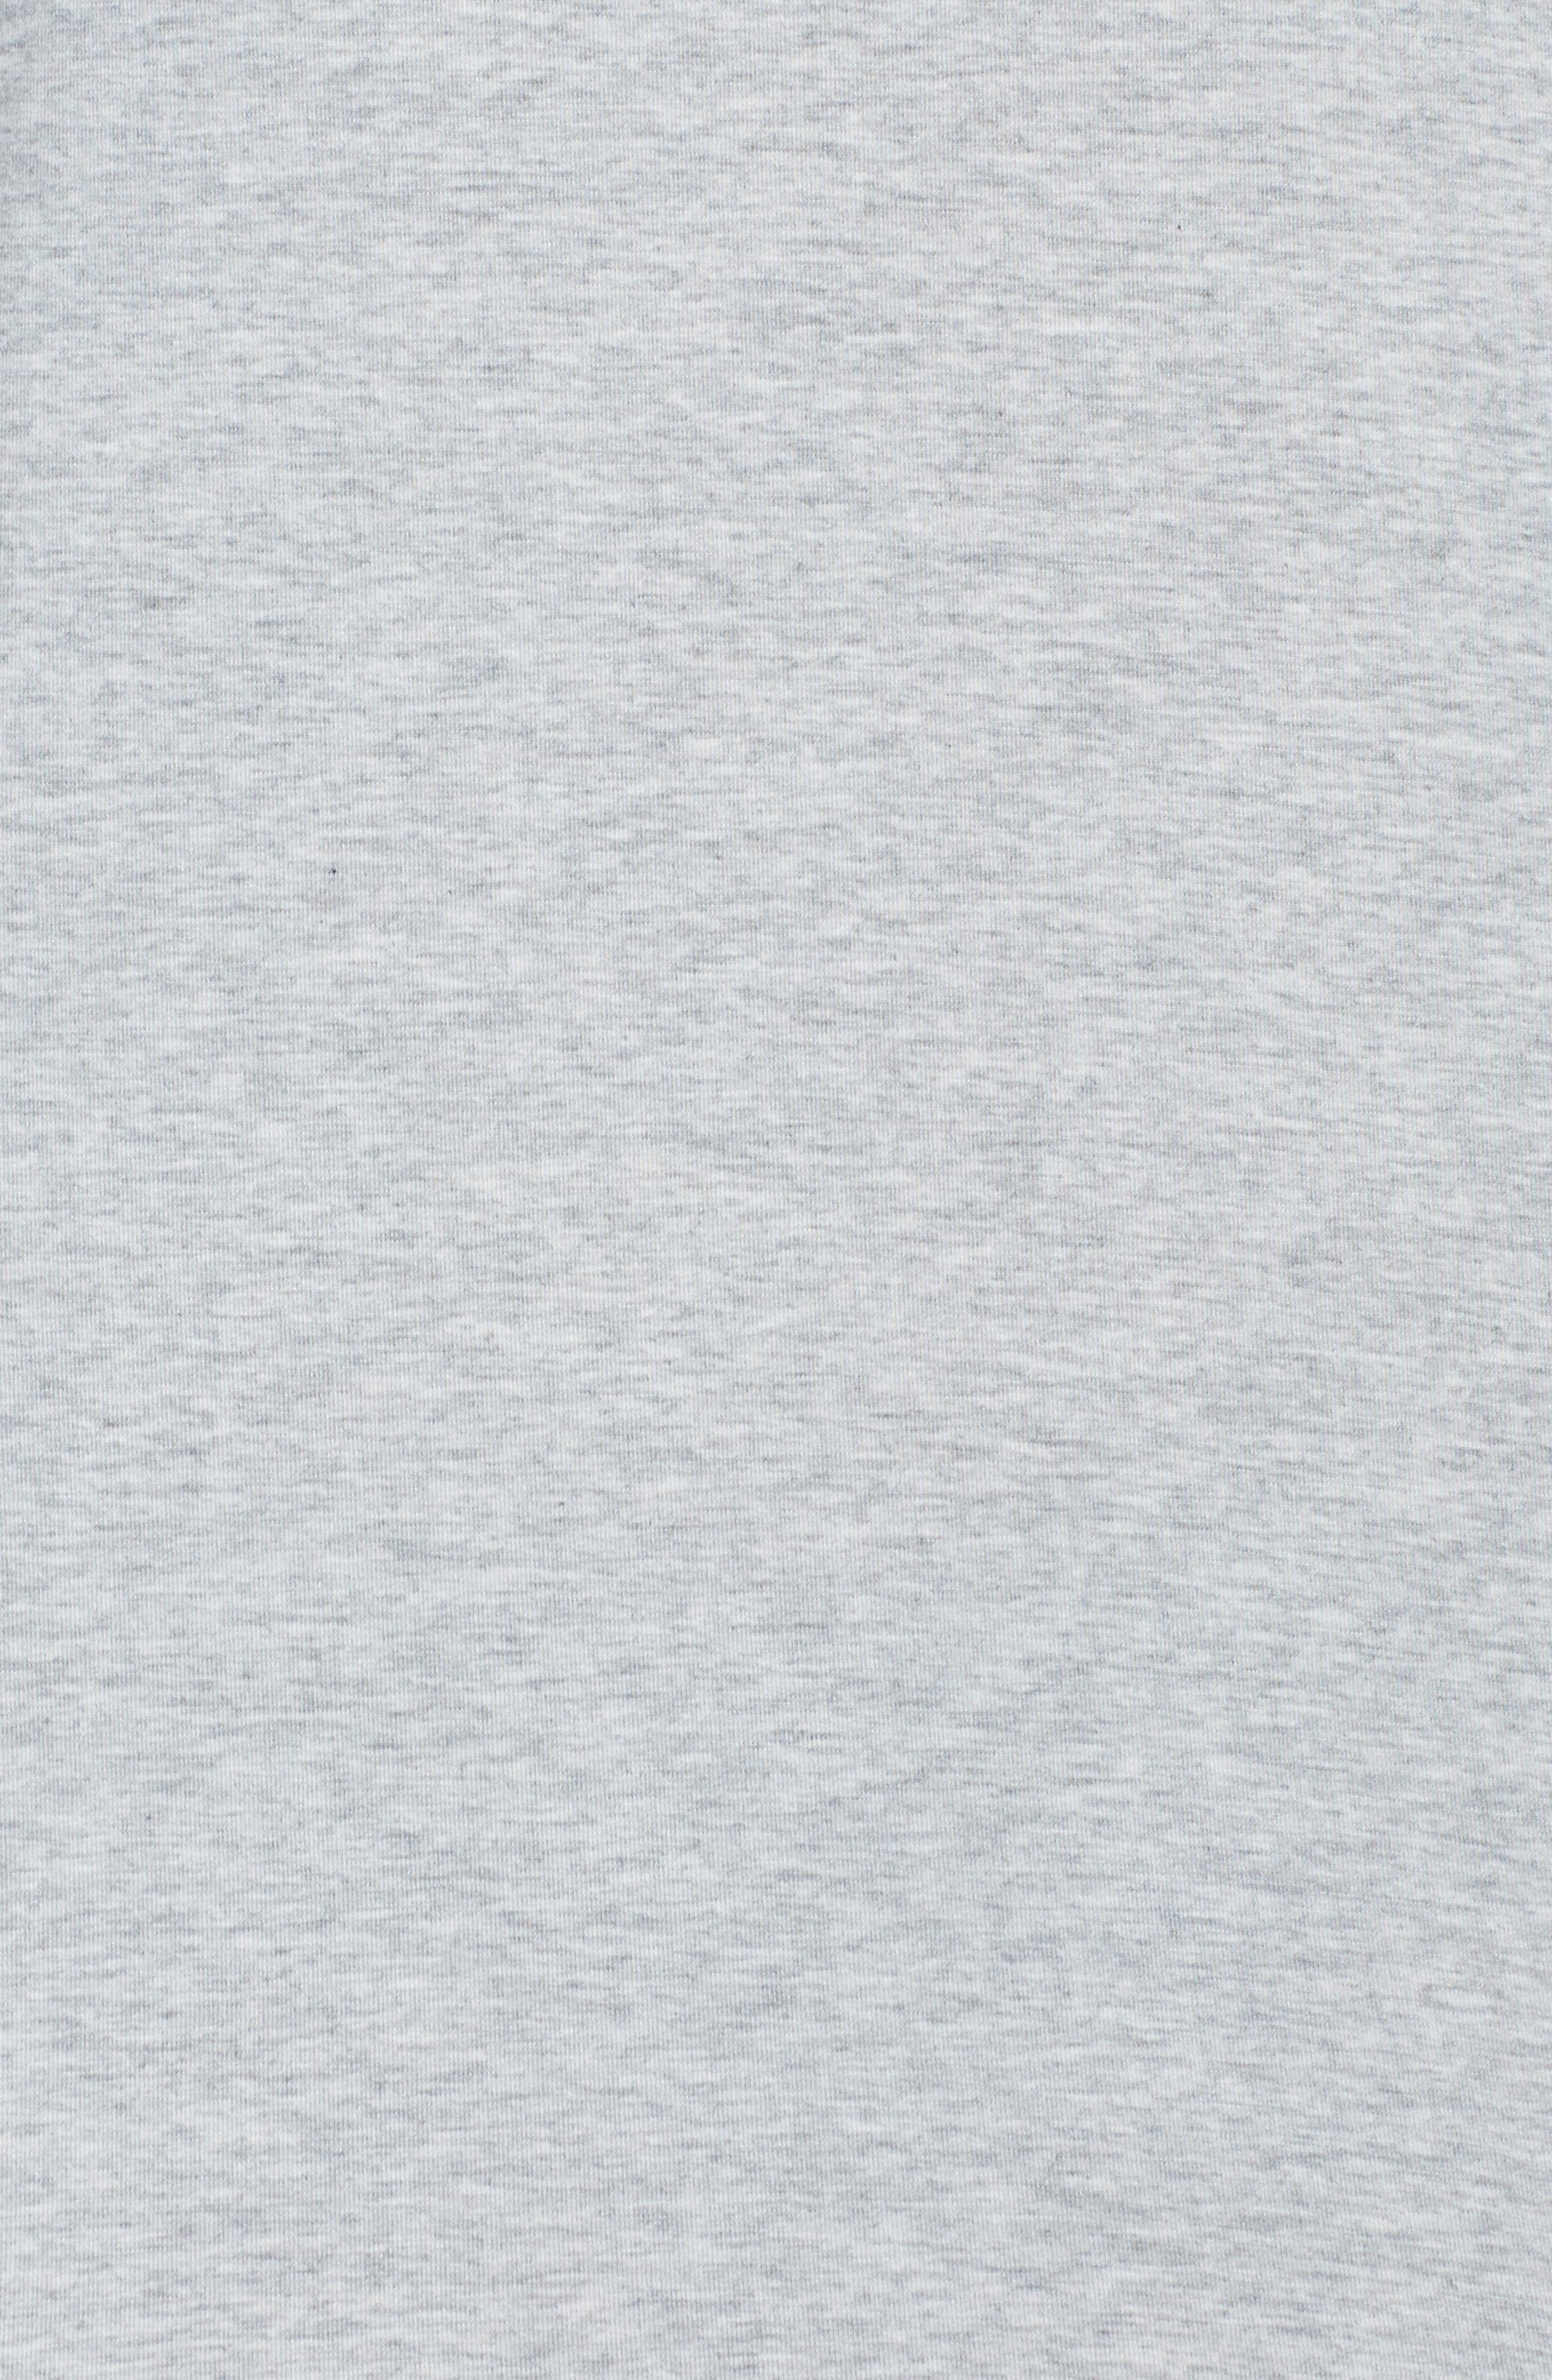 Dolman Sleeve Nightshirt,                             Alternate thumbnail 26, color,